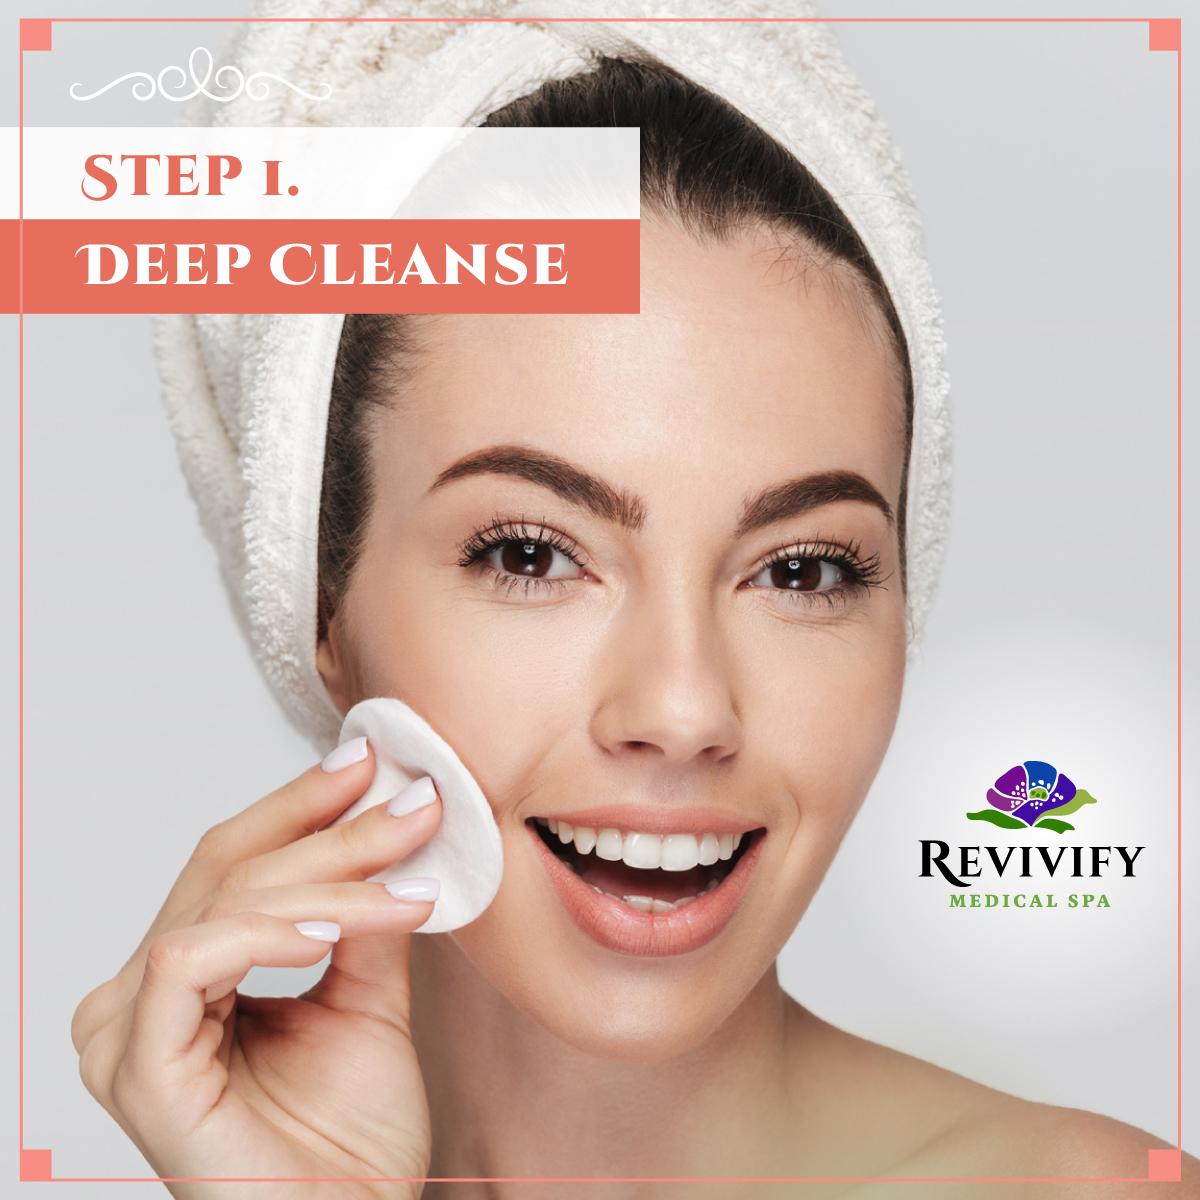 Deep cleanse